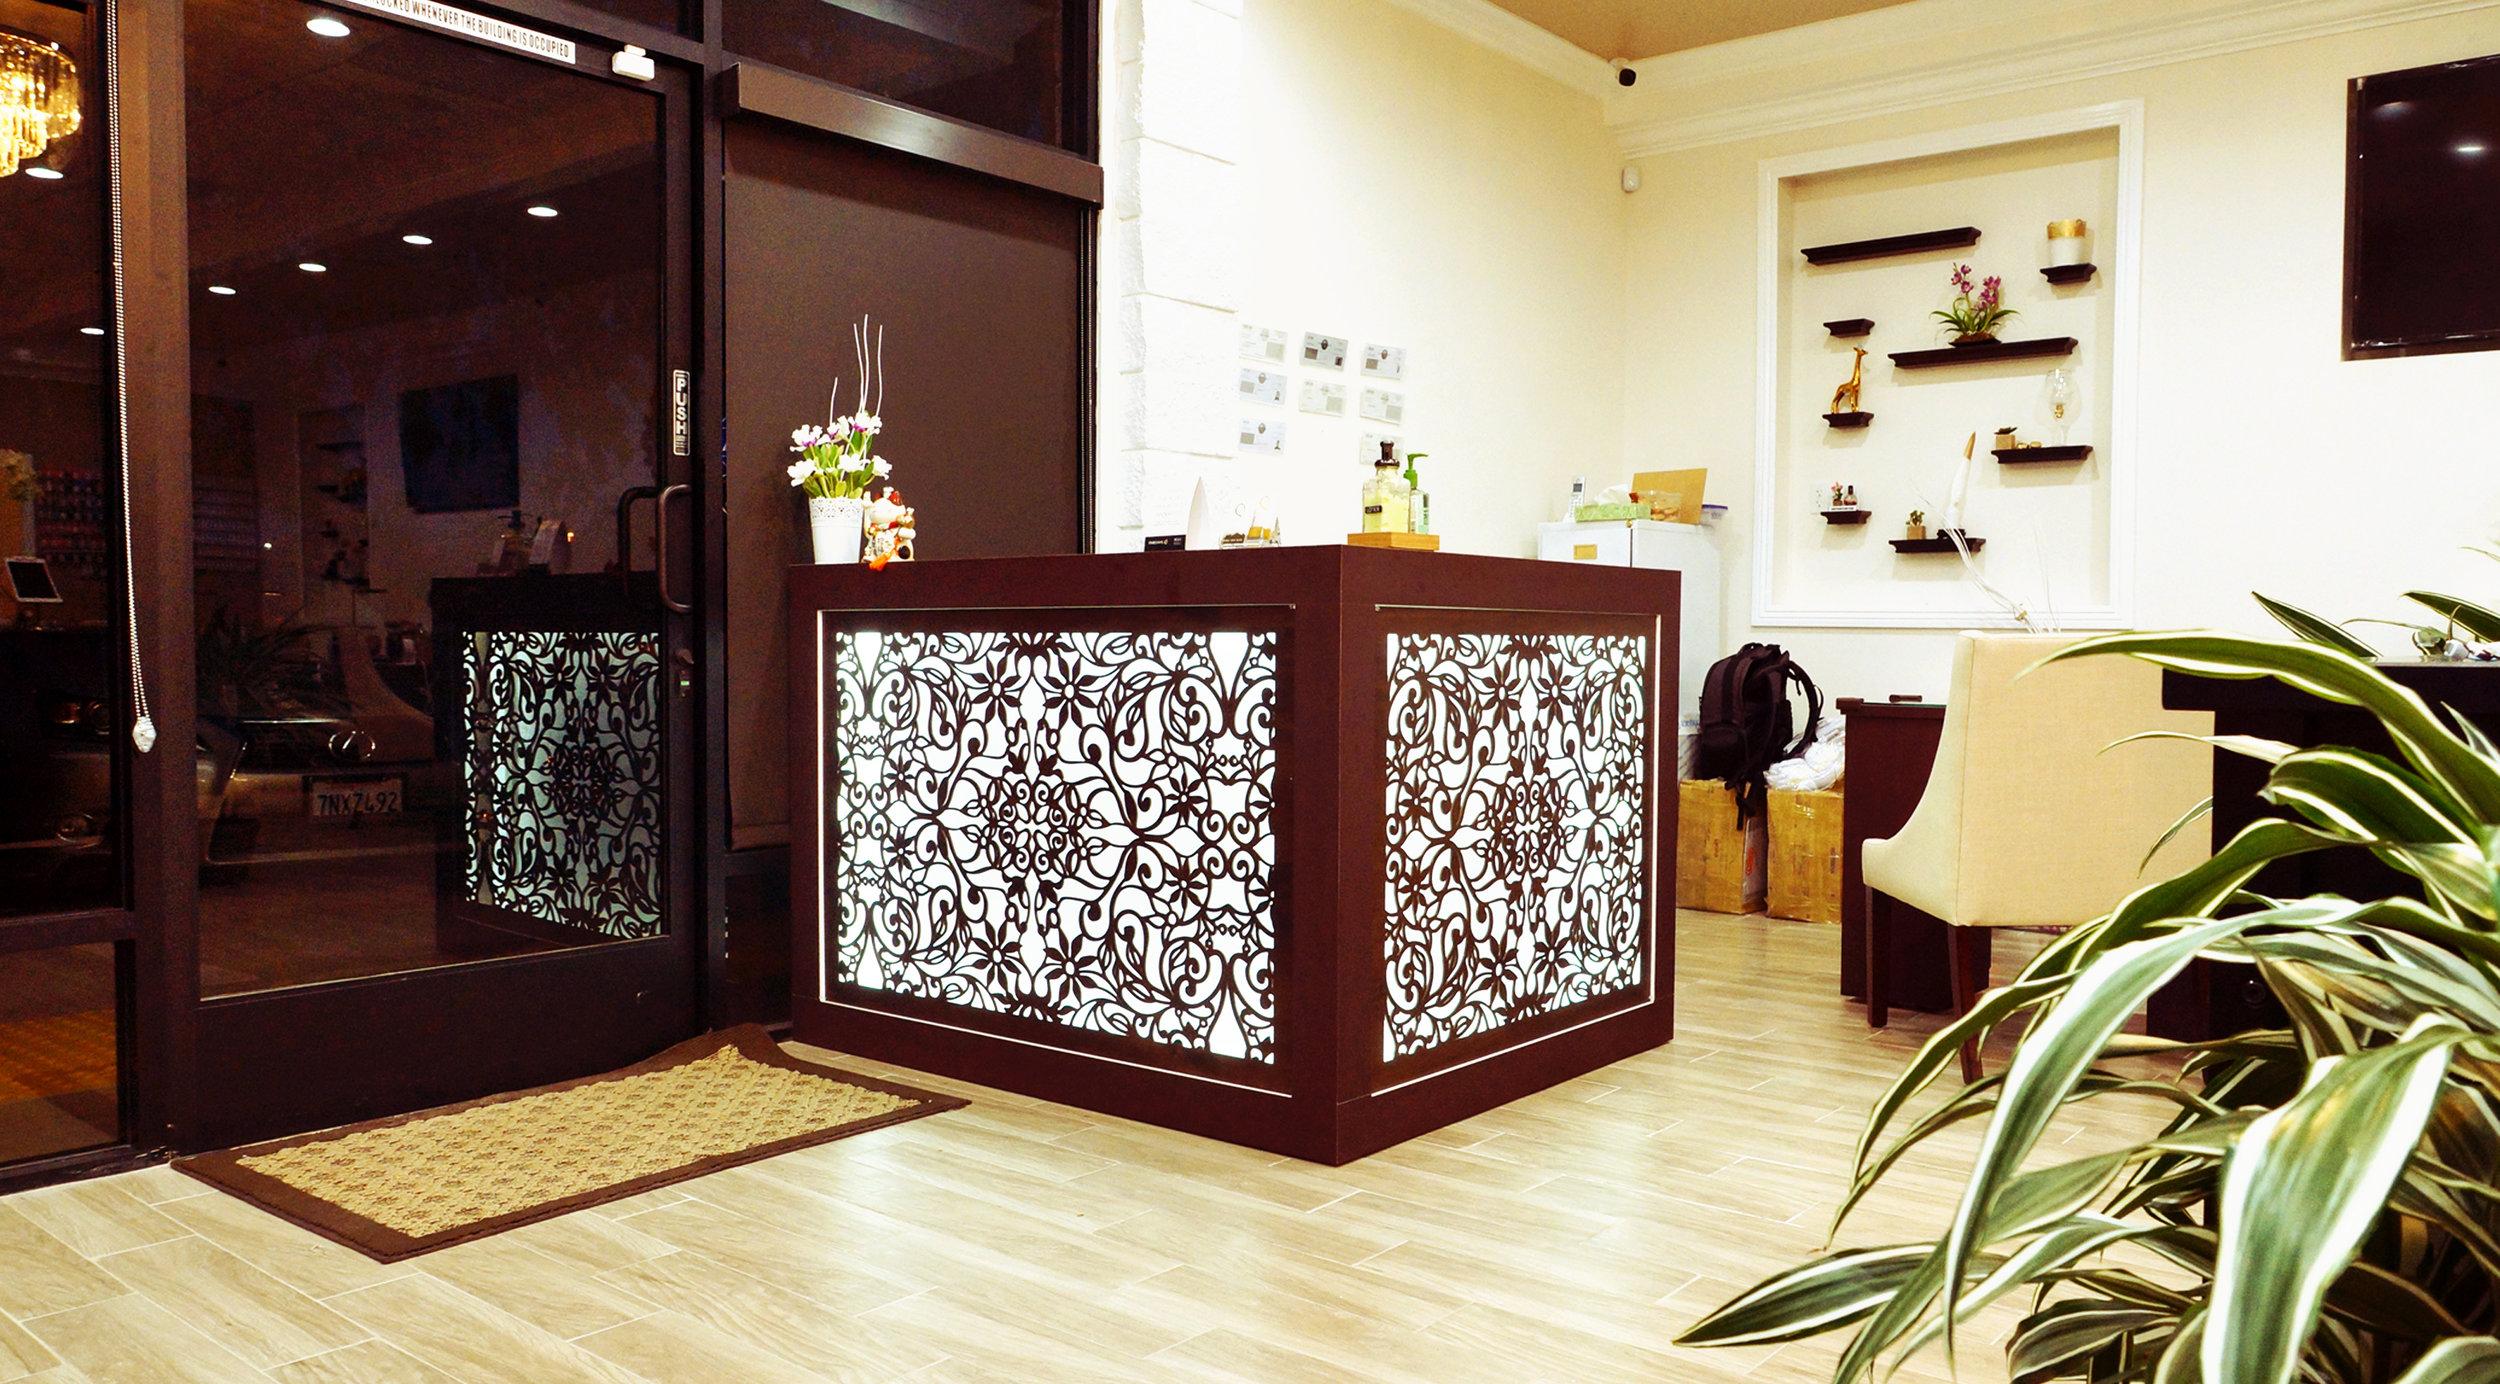 Queenie Nails, San Francisco, CA   Spring Vines, Decorative backlit reception desk